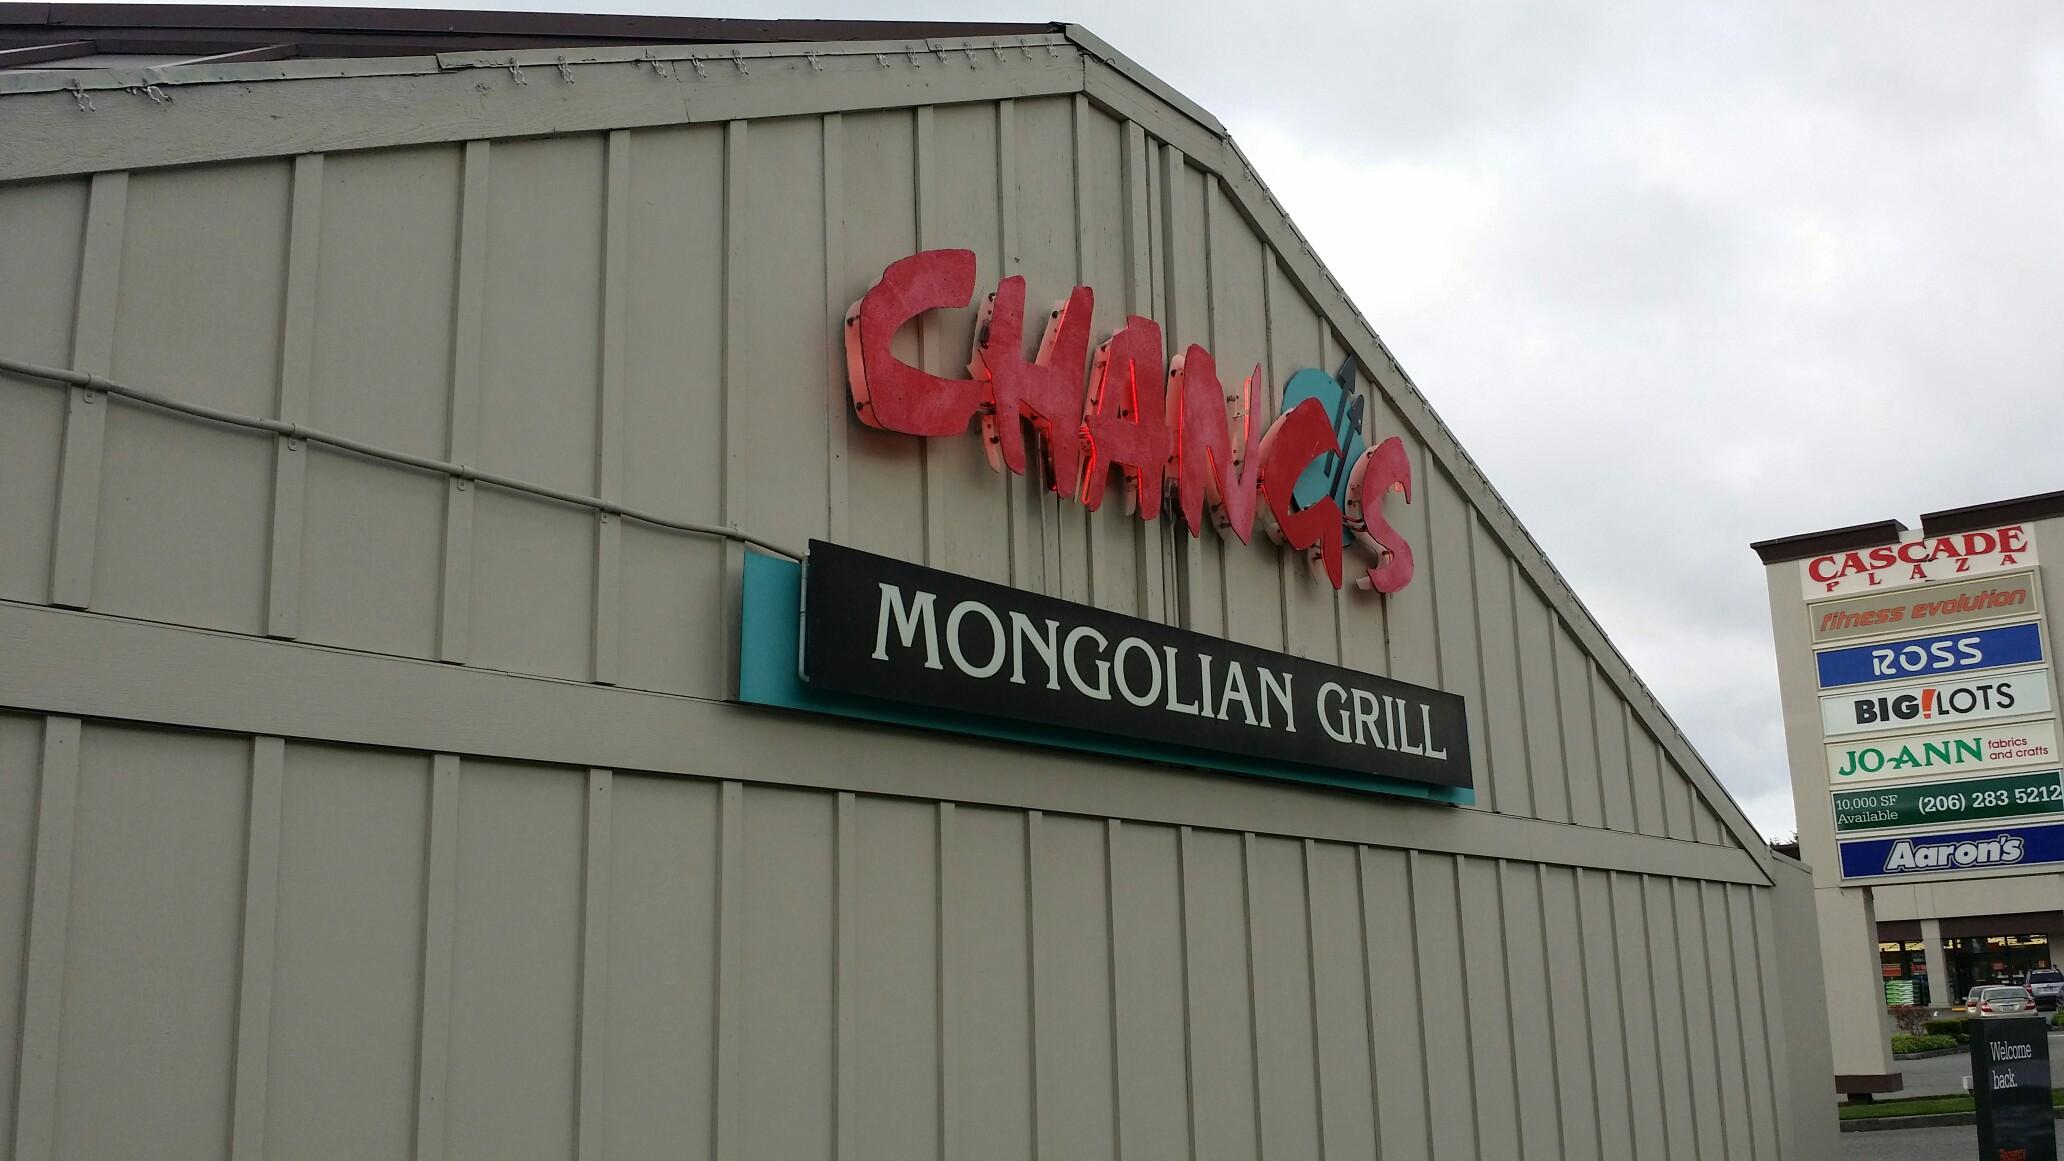 Chang's Mongolian Grill, Everett WA